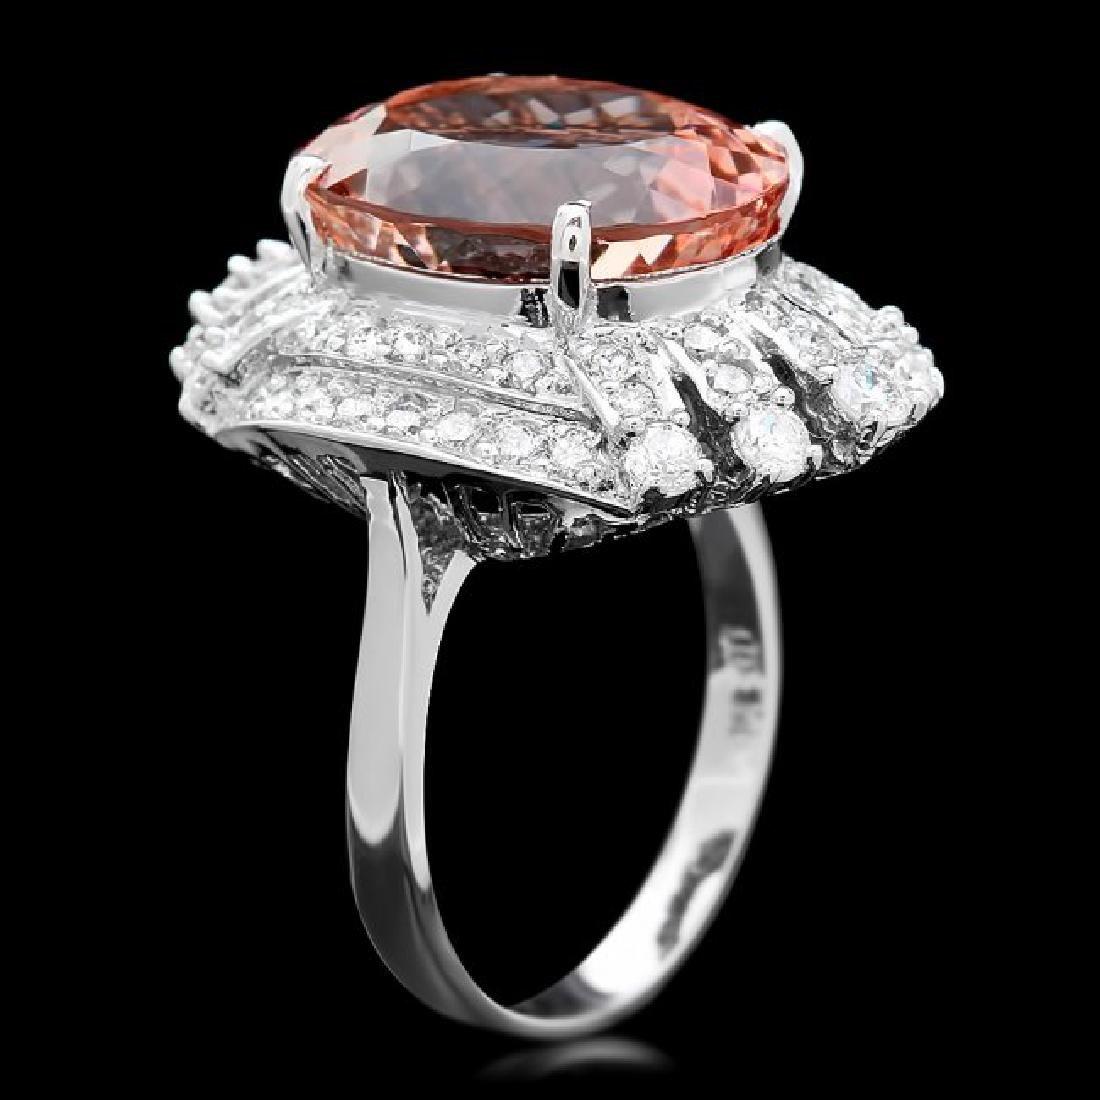 14k Gold 10.40ct Morganite 1.30ct Diamond Ring - 2